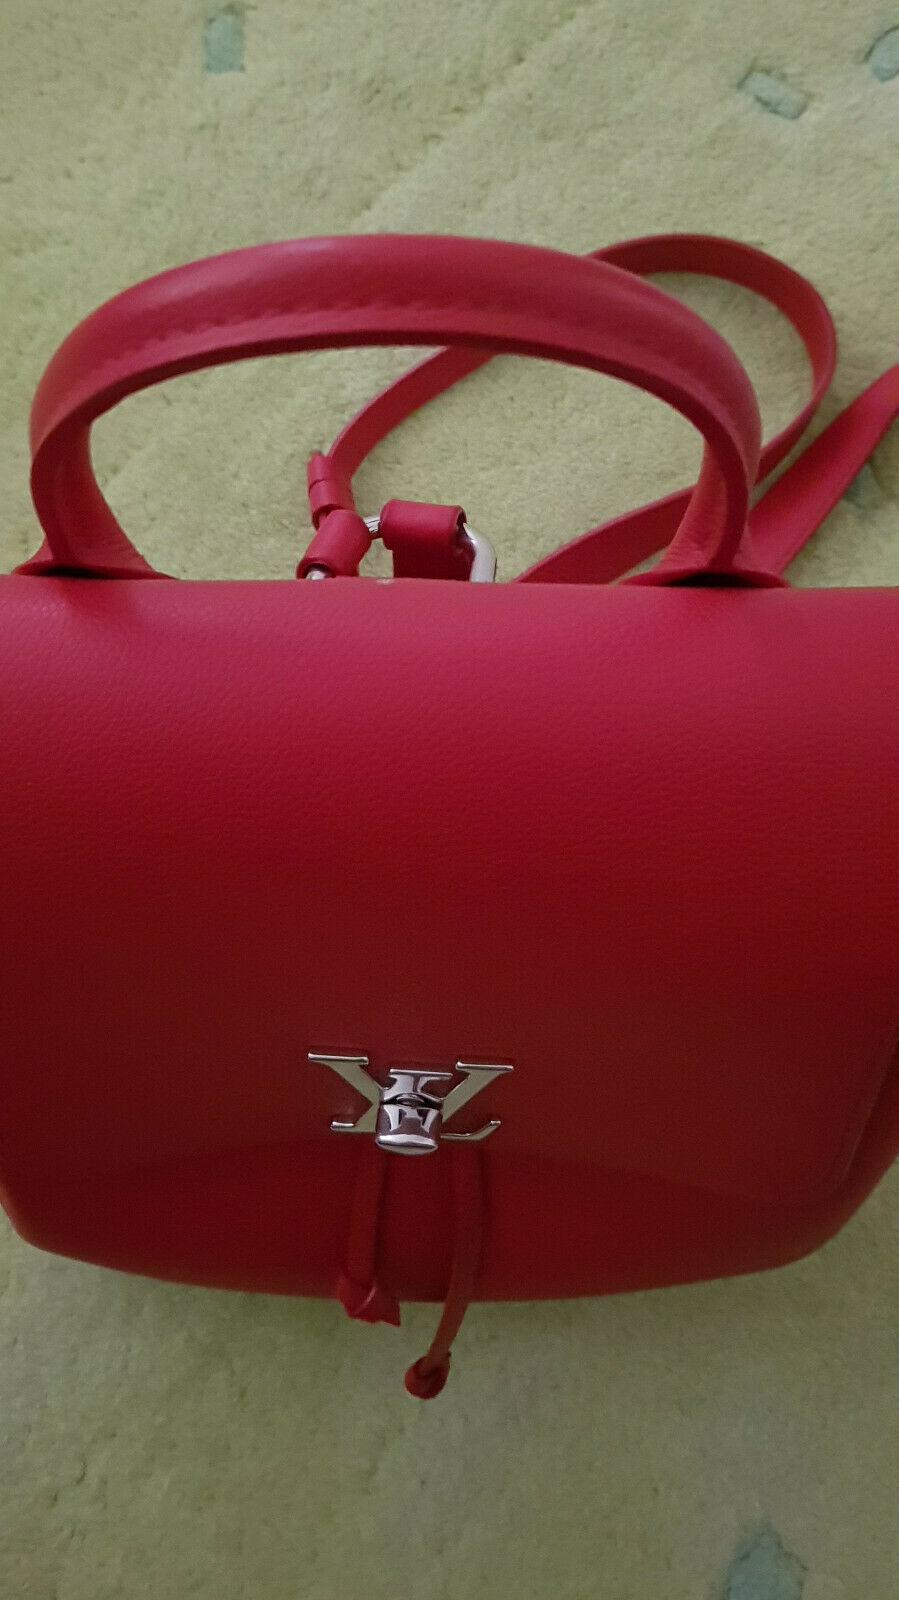 Louis Vuitton Lockme Backpack - image 5